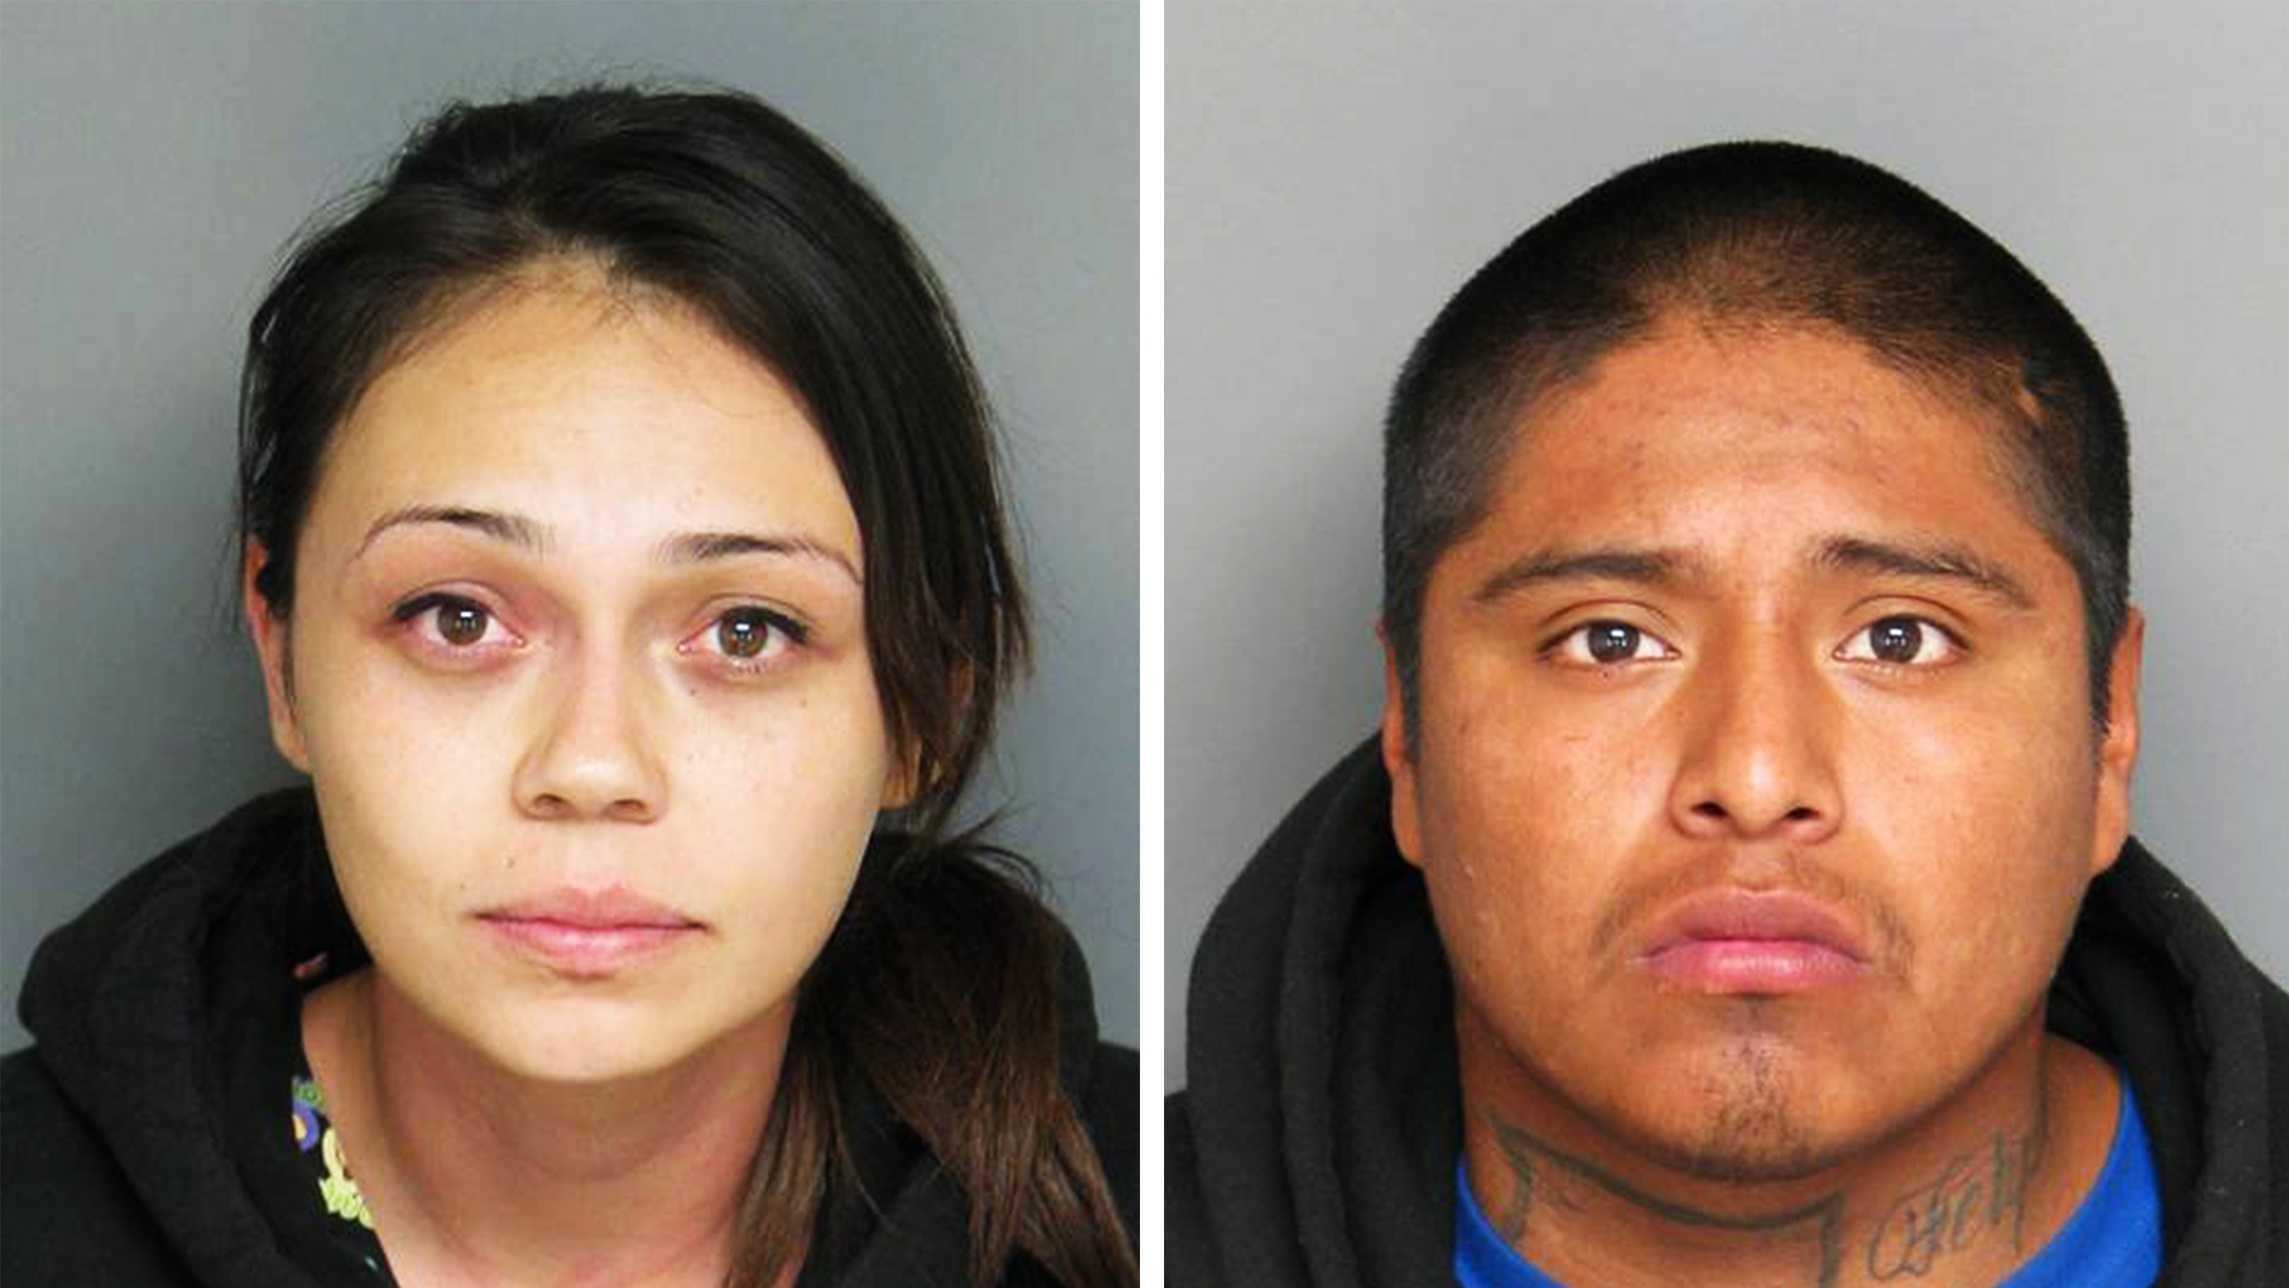 Susana Mendez, left, andAlejandro Ramirez, right, are seen in police mug shots.